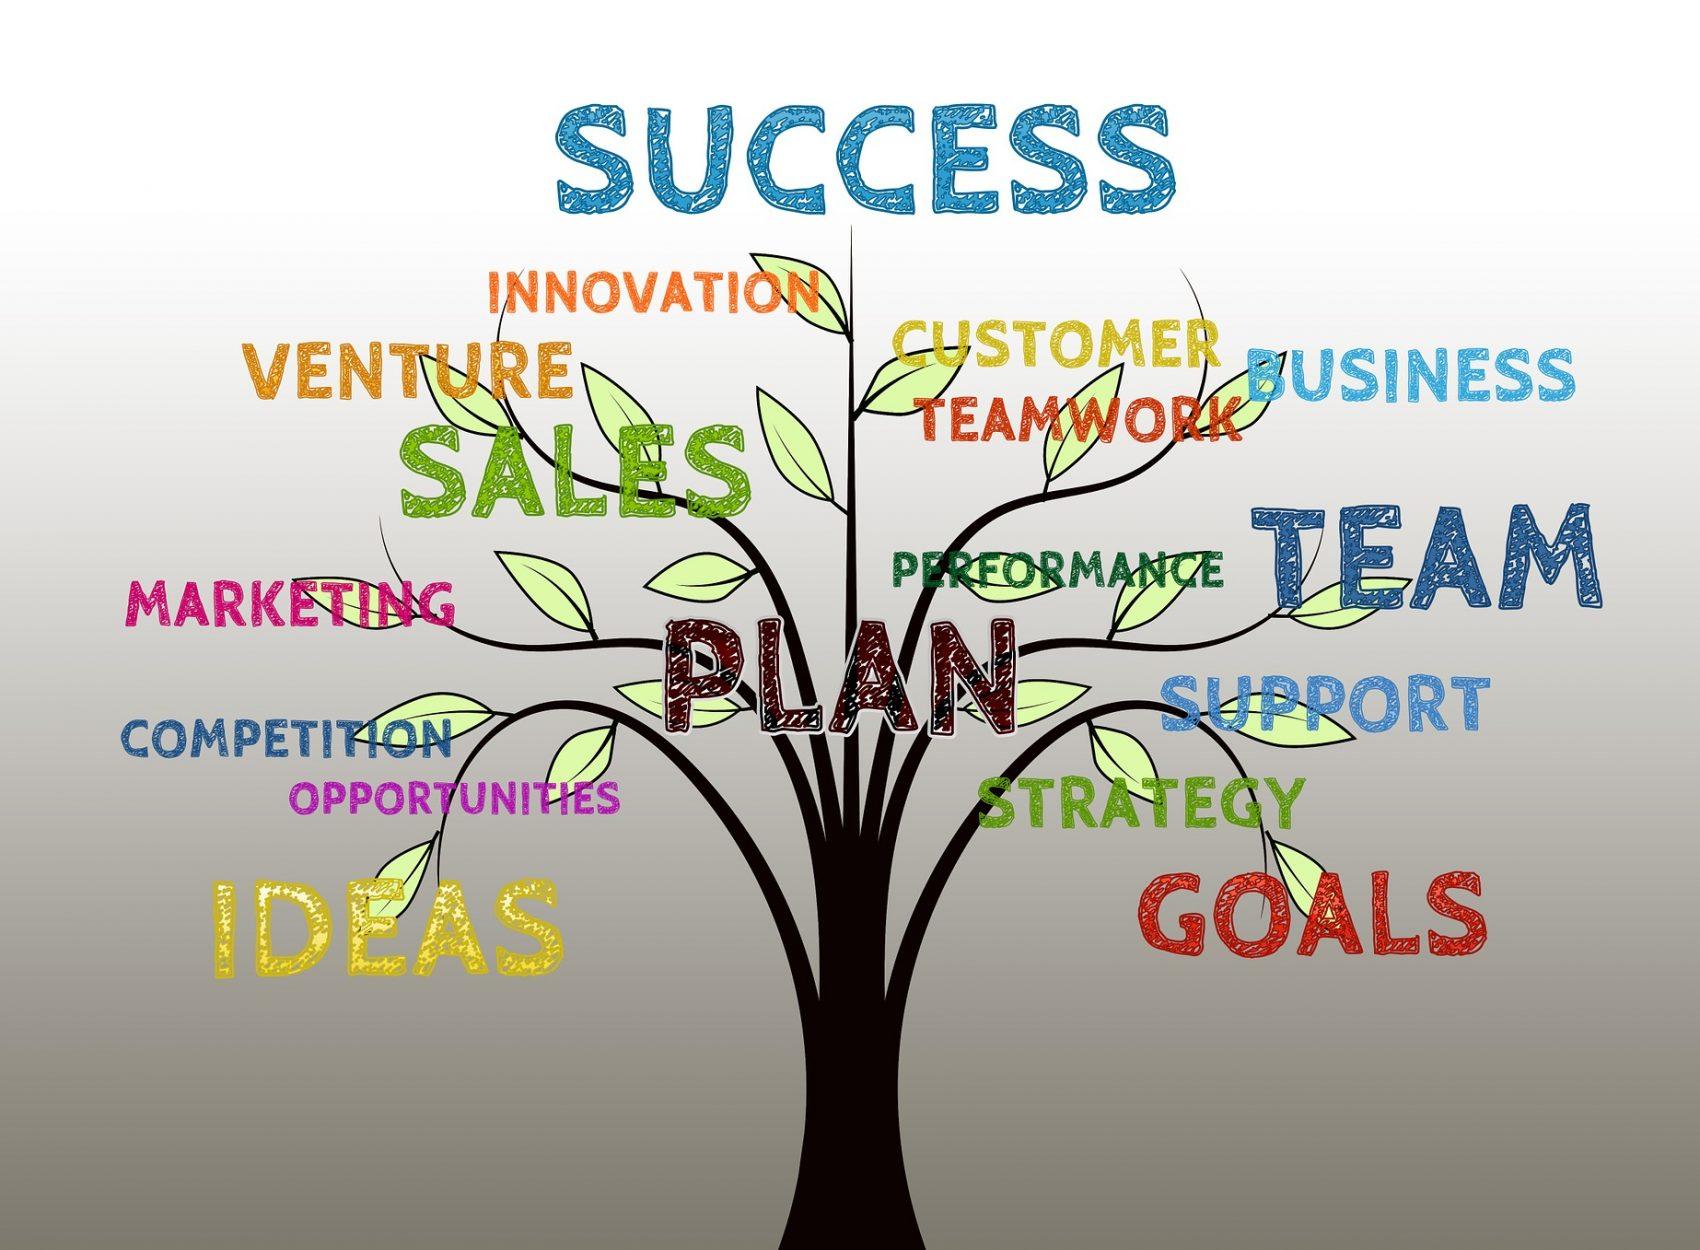 Strategia aziendale in 5 mosse